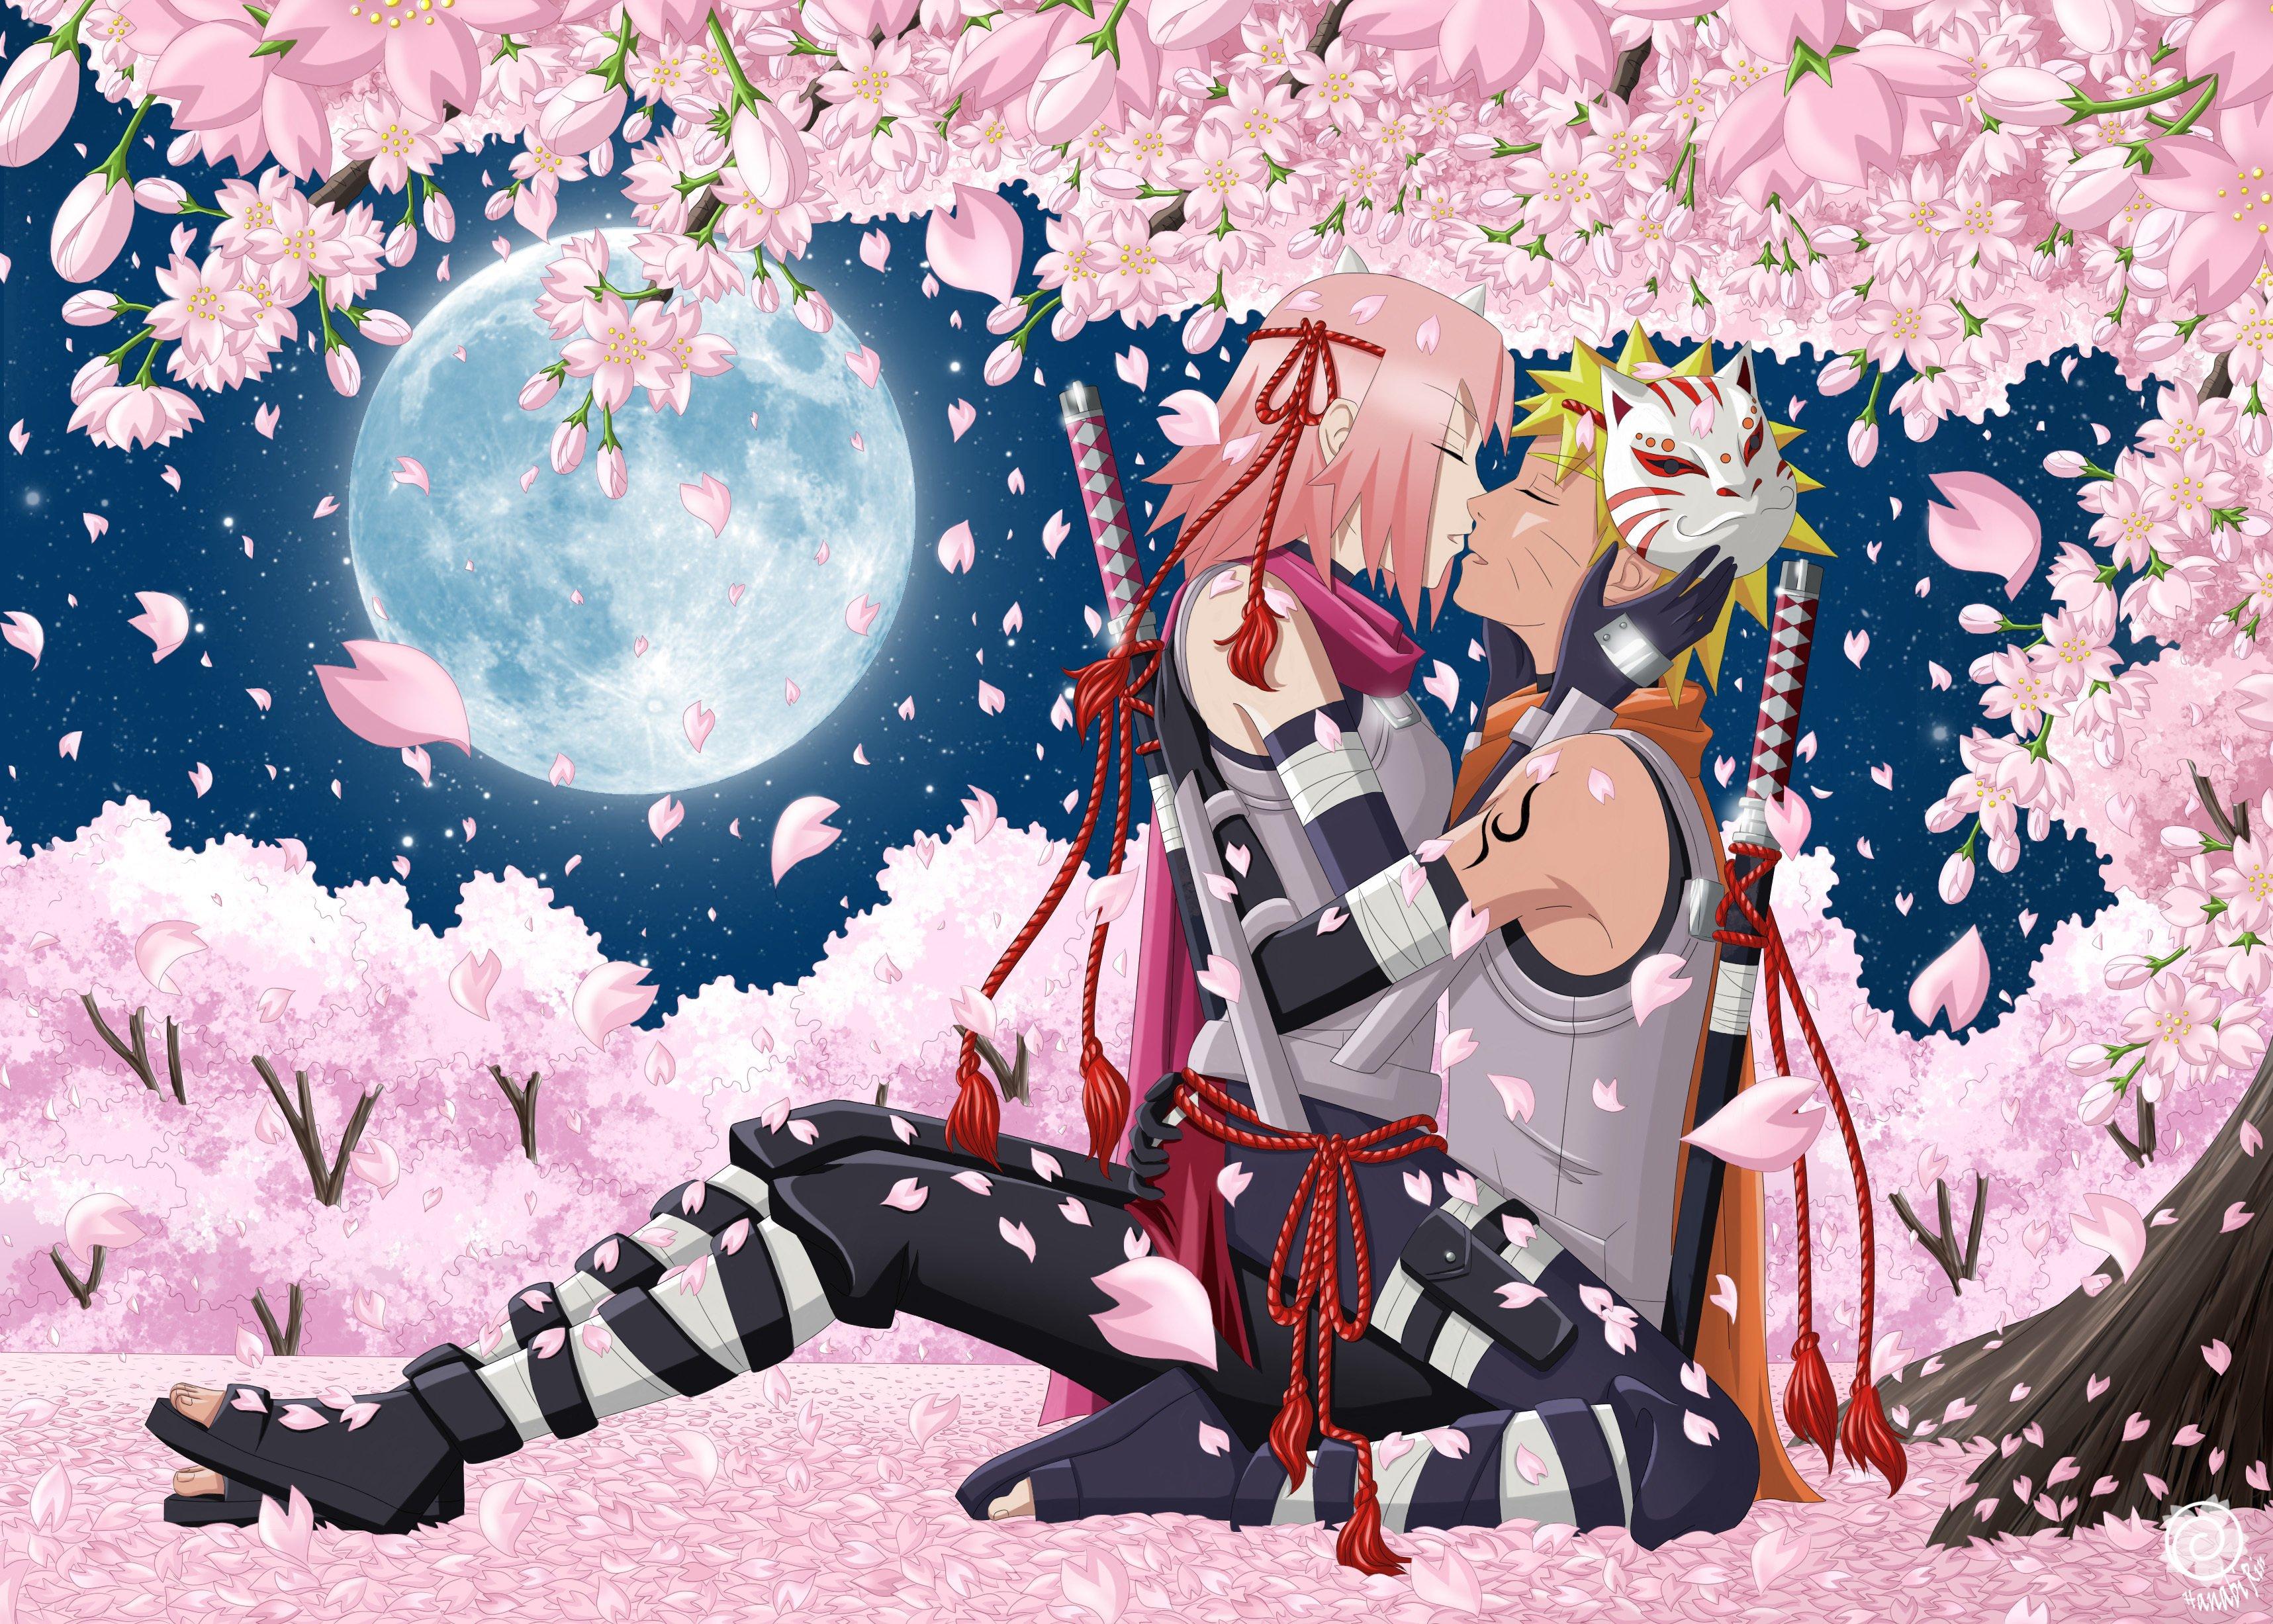 Most Inspiring Wallpaper Naruto Art - d860b8a391c96aee2ffded1cc9888a15  You Should Have_885261.jpg